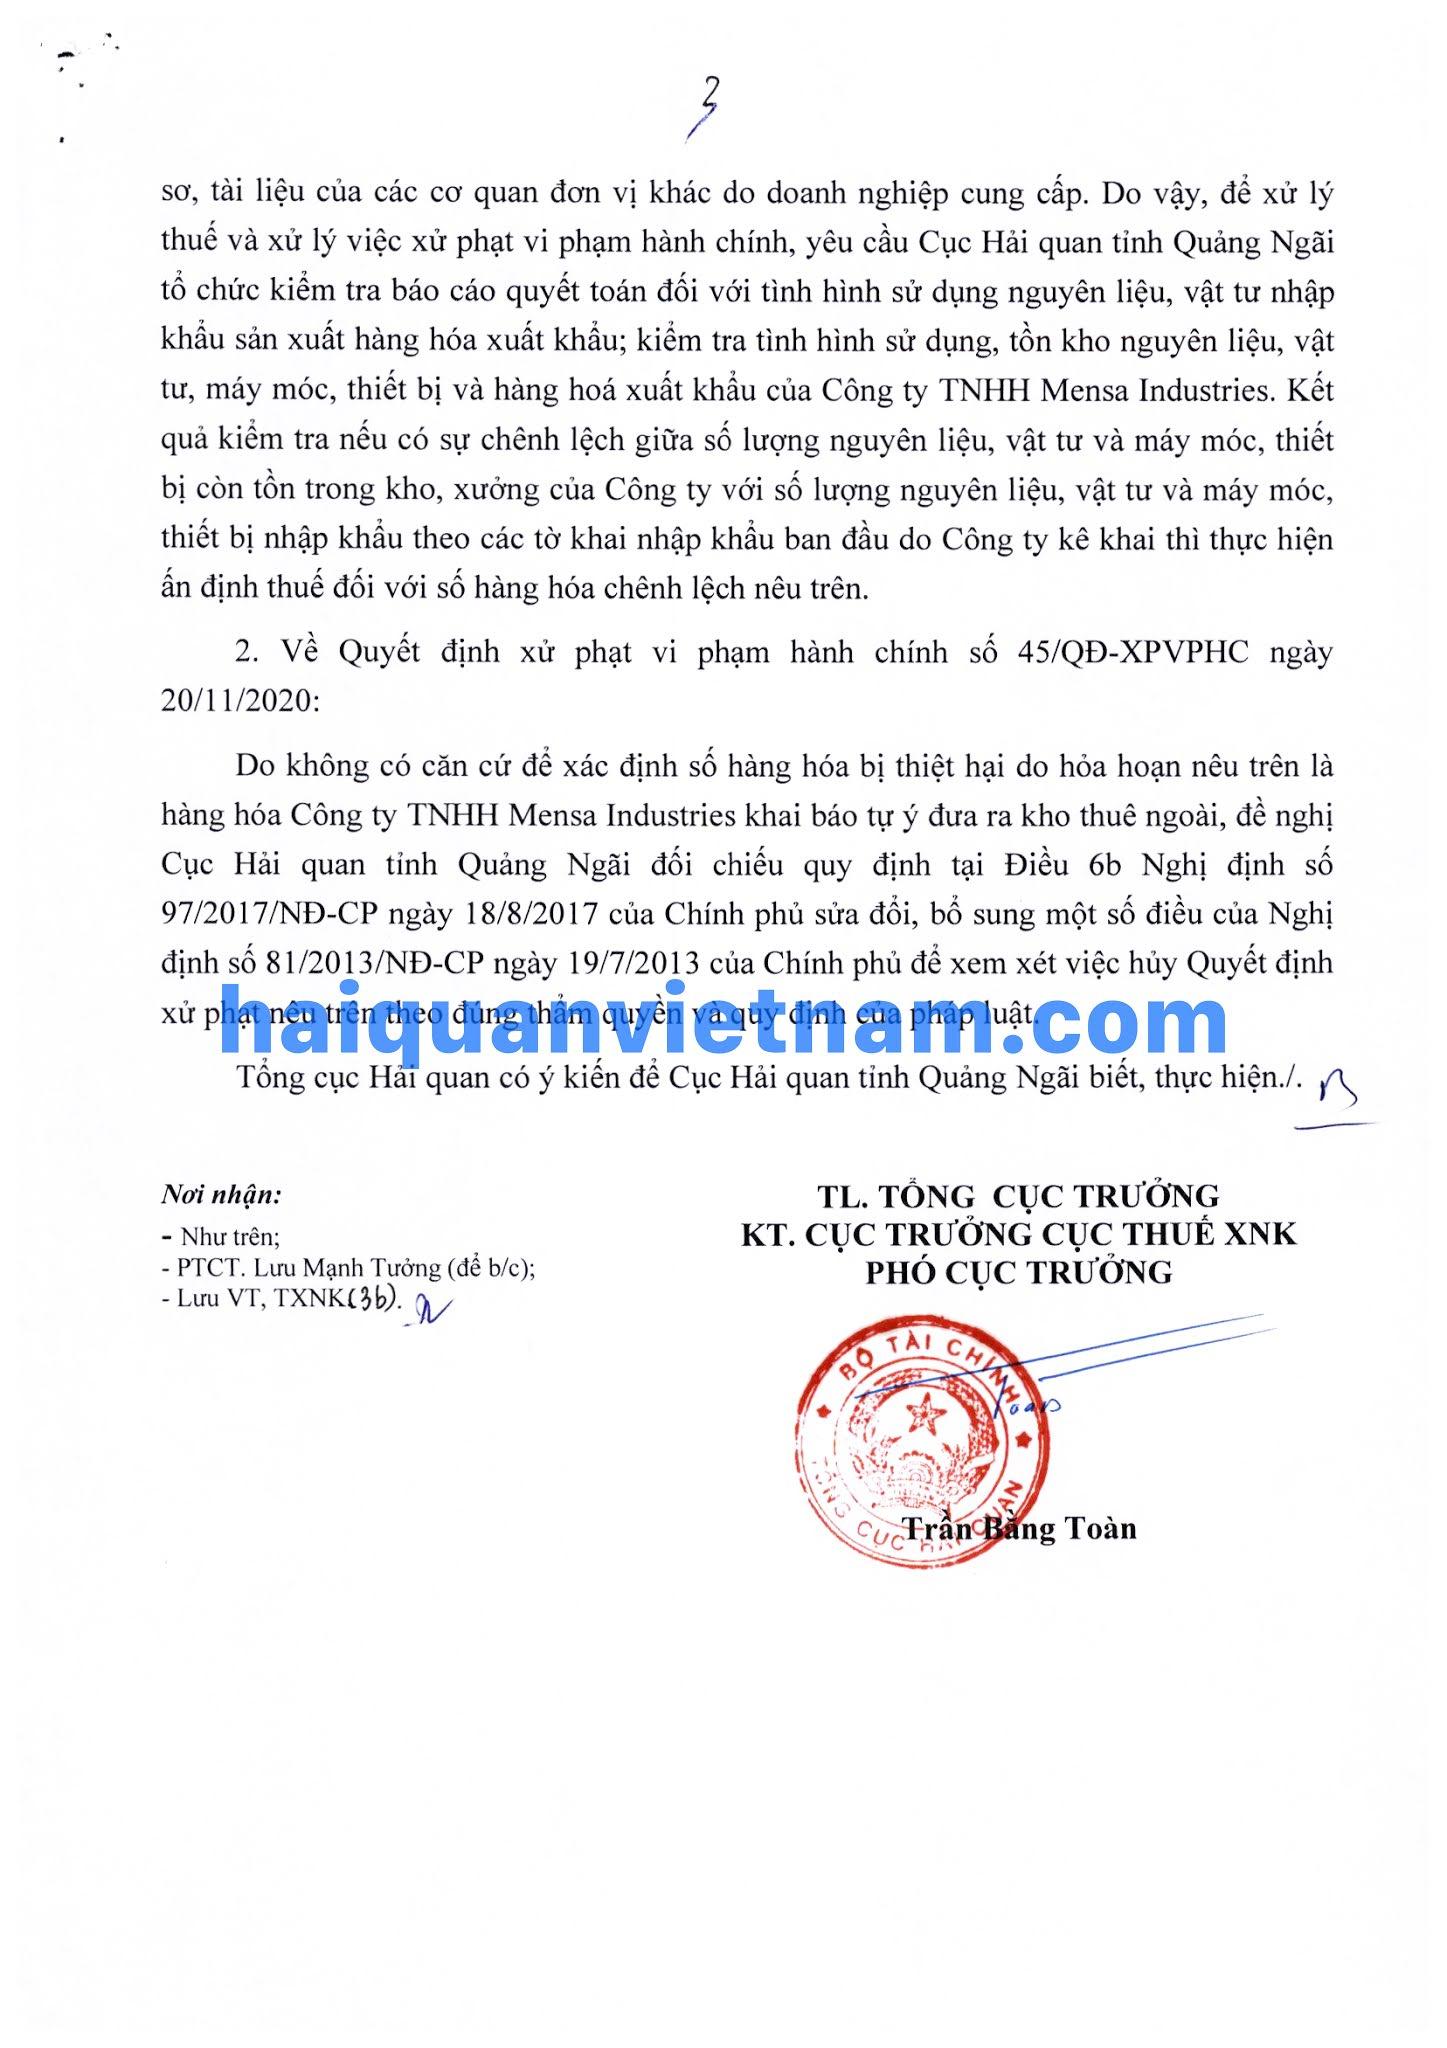 [Image: 210709-3469-TCHQ-TXNK_haiquanvietnam_03.jpg]